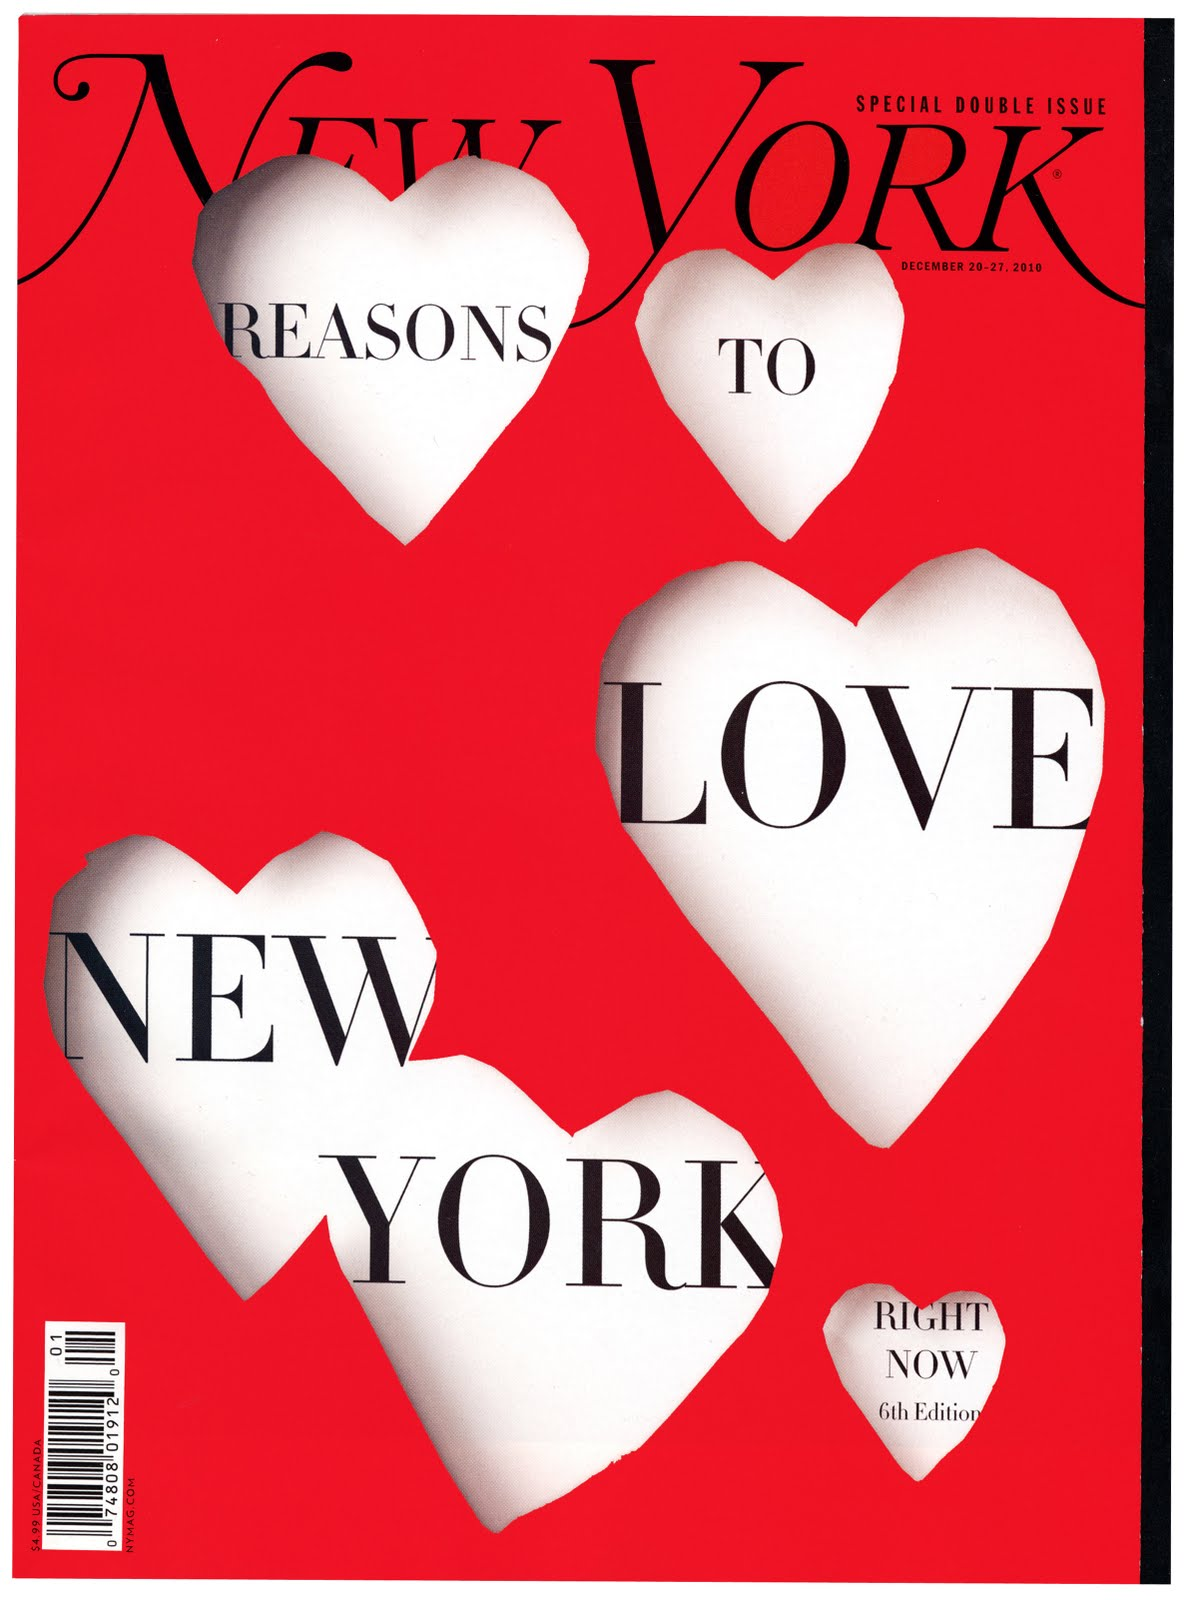 spine out new york magazine cover. Black Bedroom Furniture Sets. Home Design Ideas